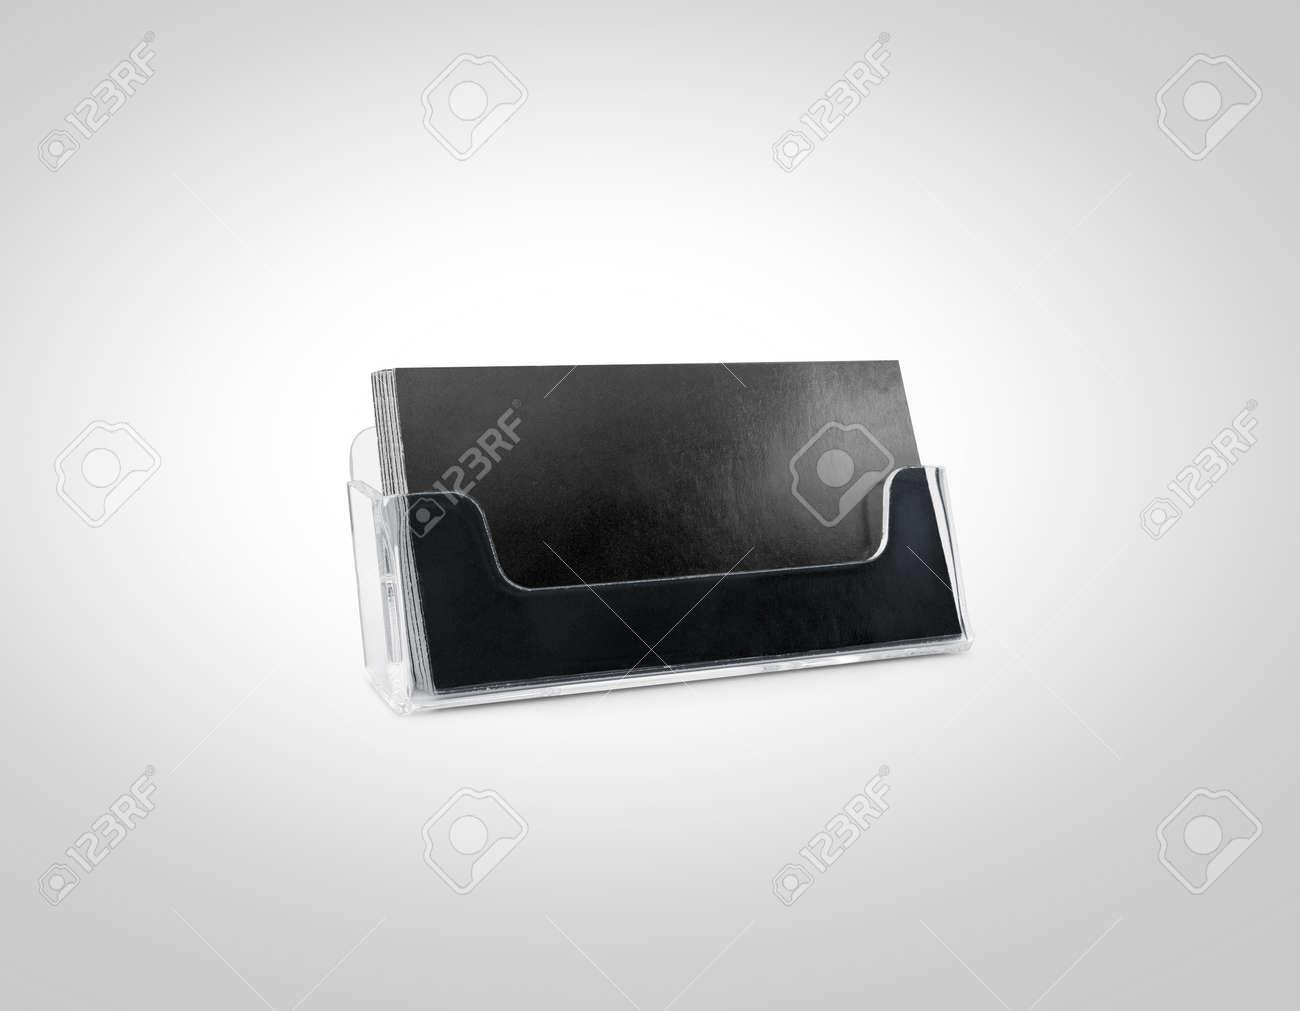 Black Business Card Mockup Holder Isolated. Plastic Transparent ...